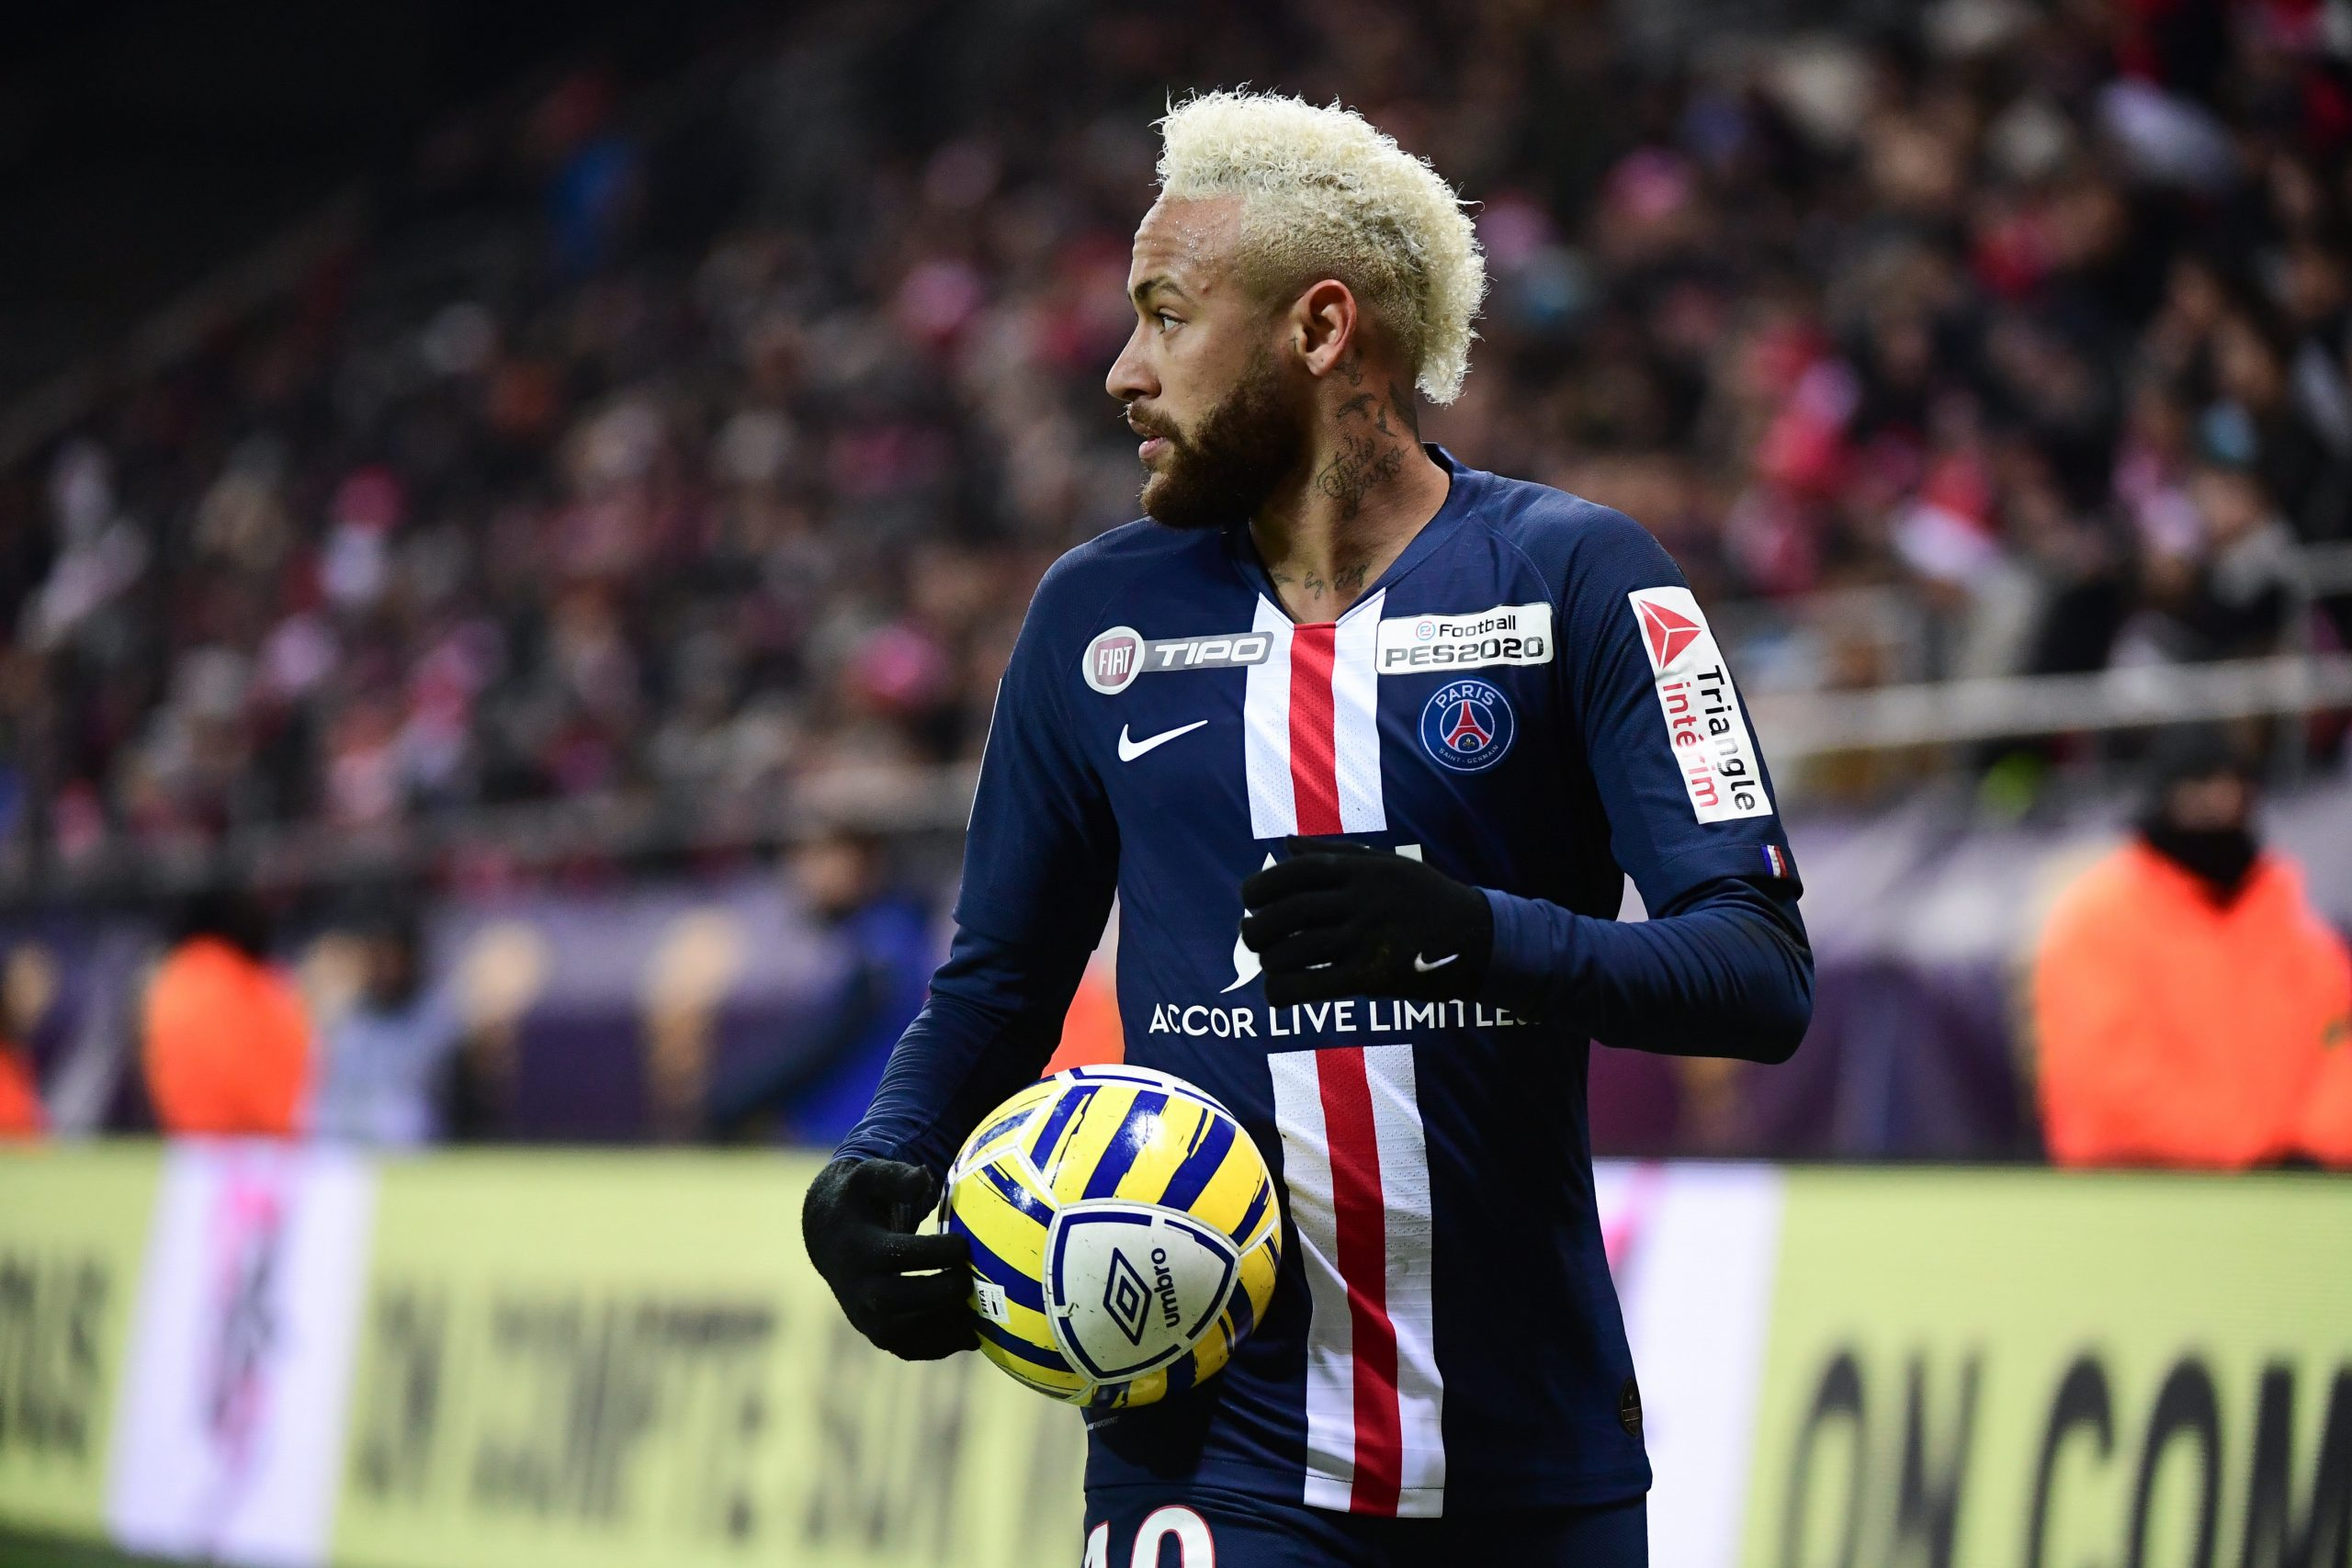 Neymar ne fera pas une grande fête pour son avenir, confirme UOL Esporte